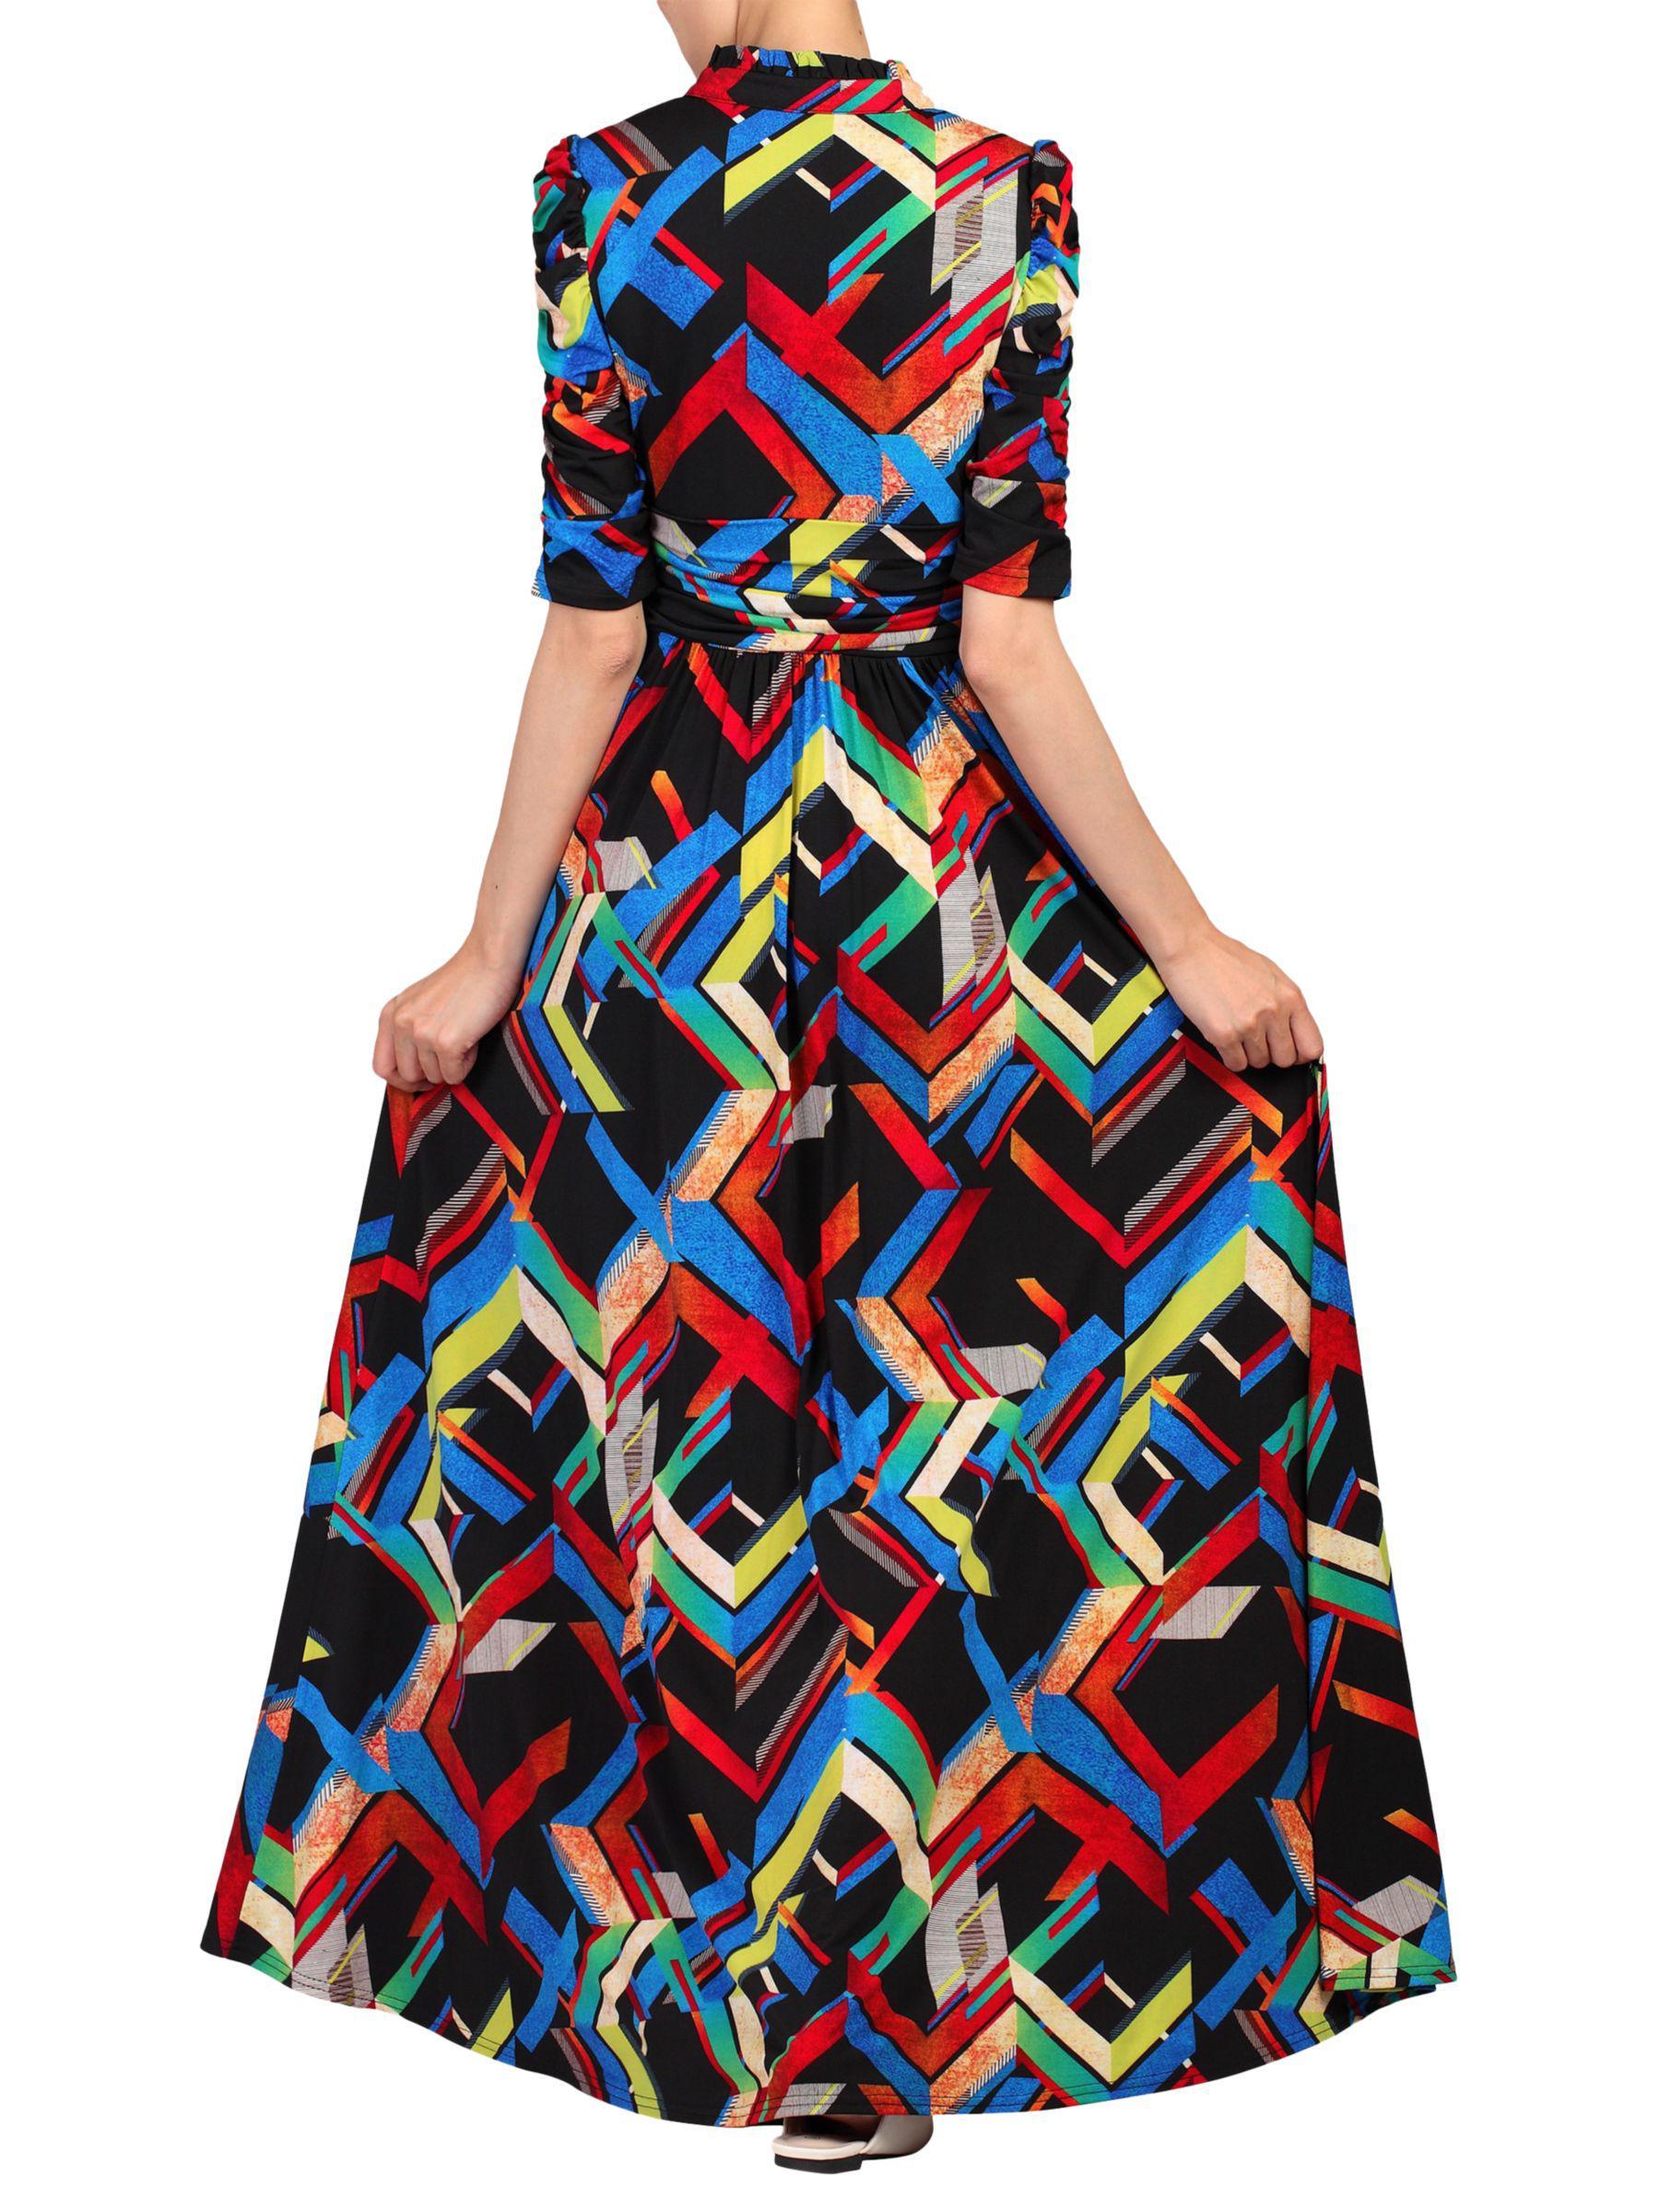 e3d962a6d1 Jolie Moi Abstract Print Tie Collar Maxi Dress in Black - Lyst